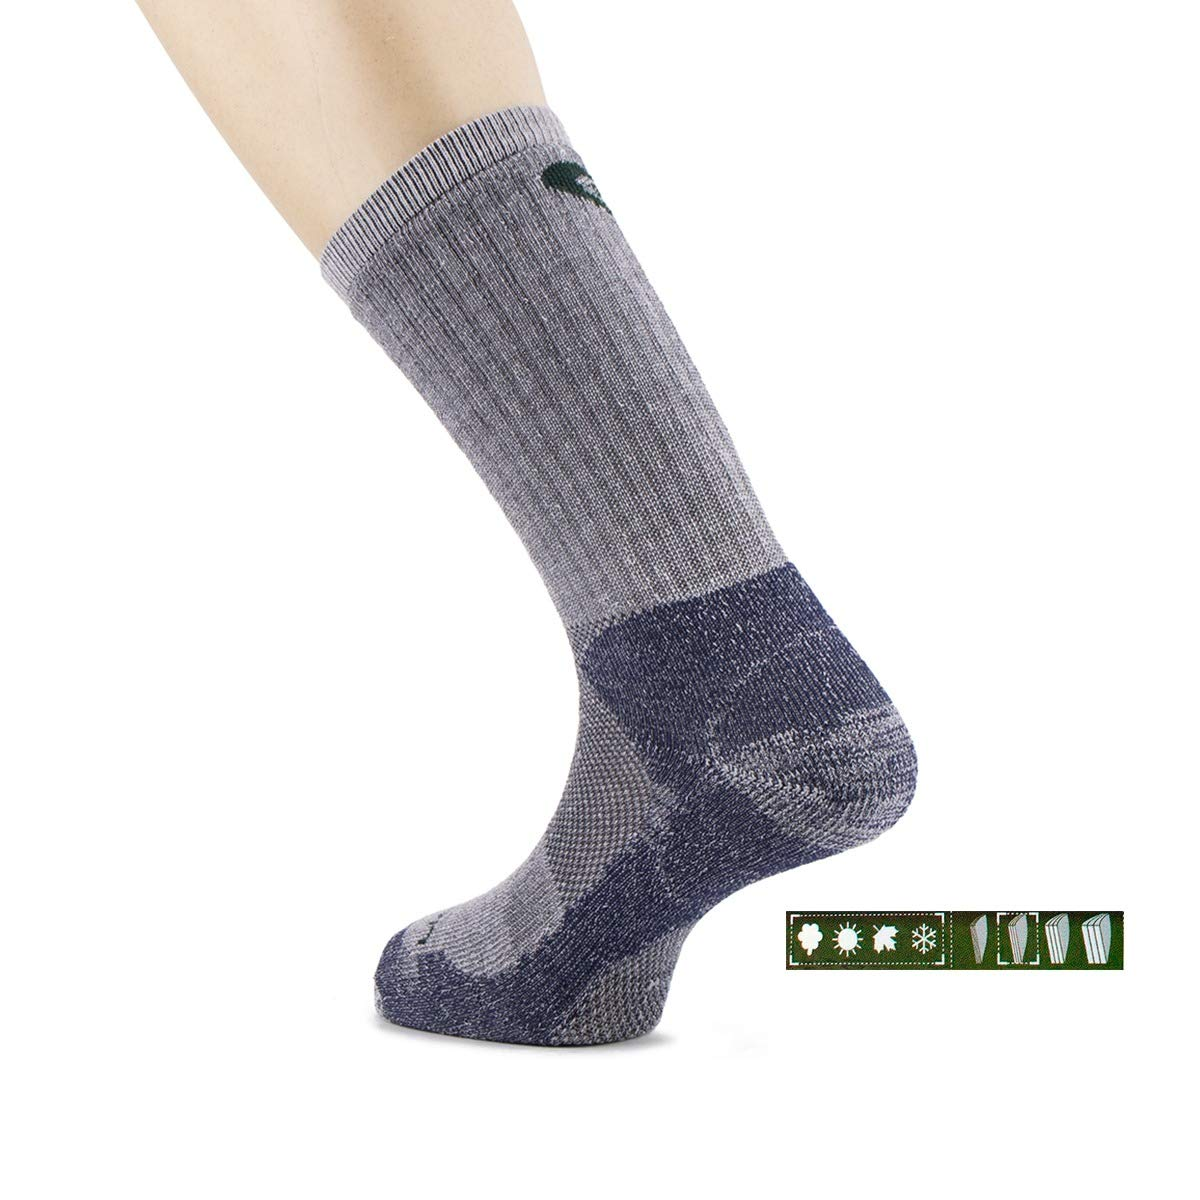 Unisex Adulto Lorpen Liner Socks Coolmax Calcetines de Forro